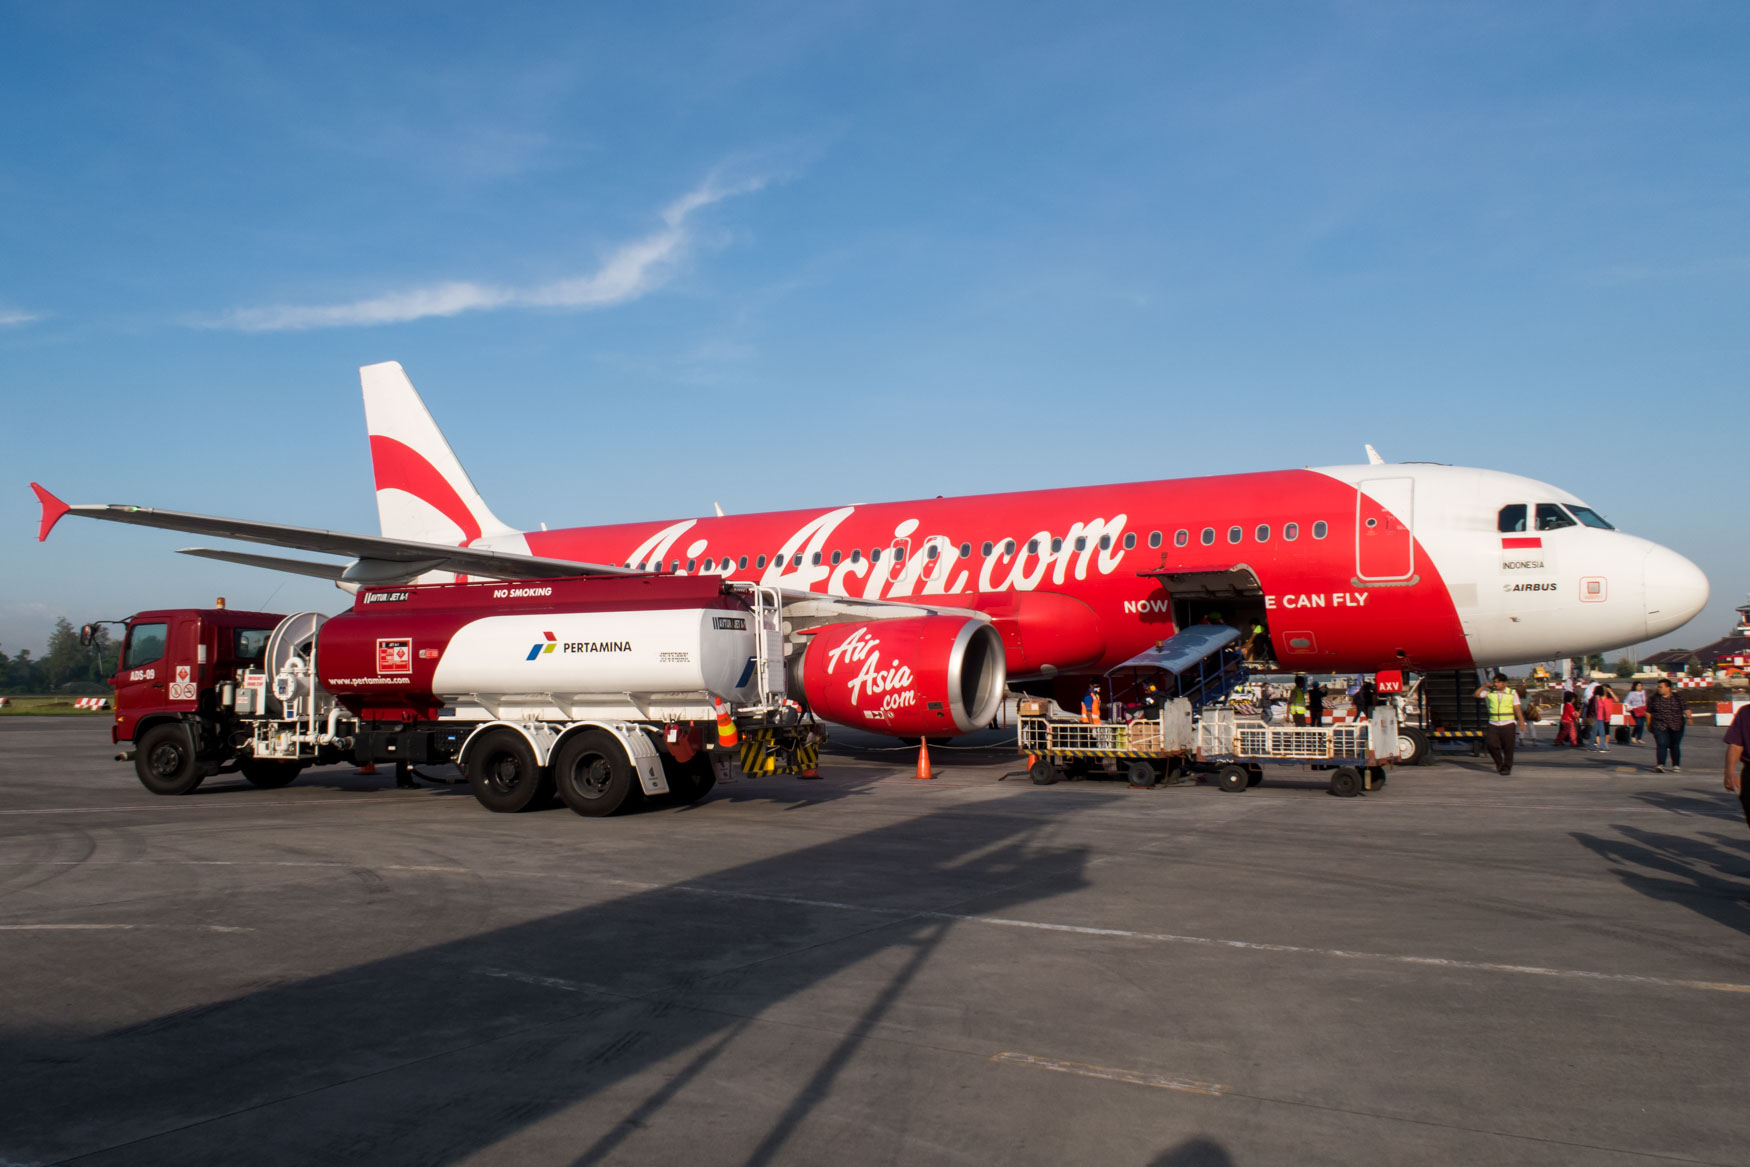 Indonesia AirAsia A320 in Yogyakarta